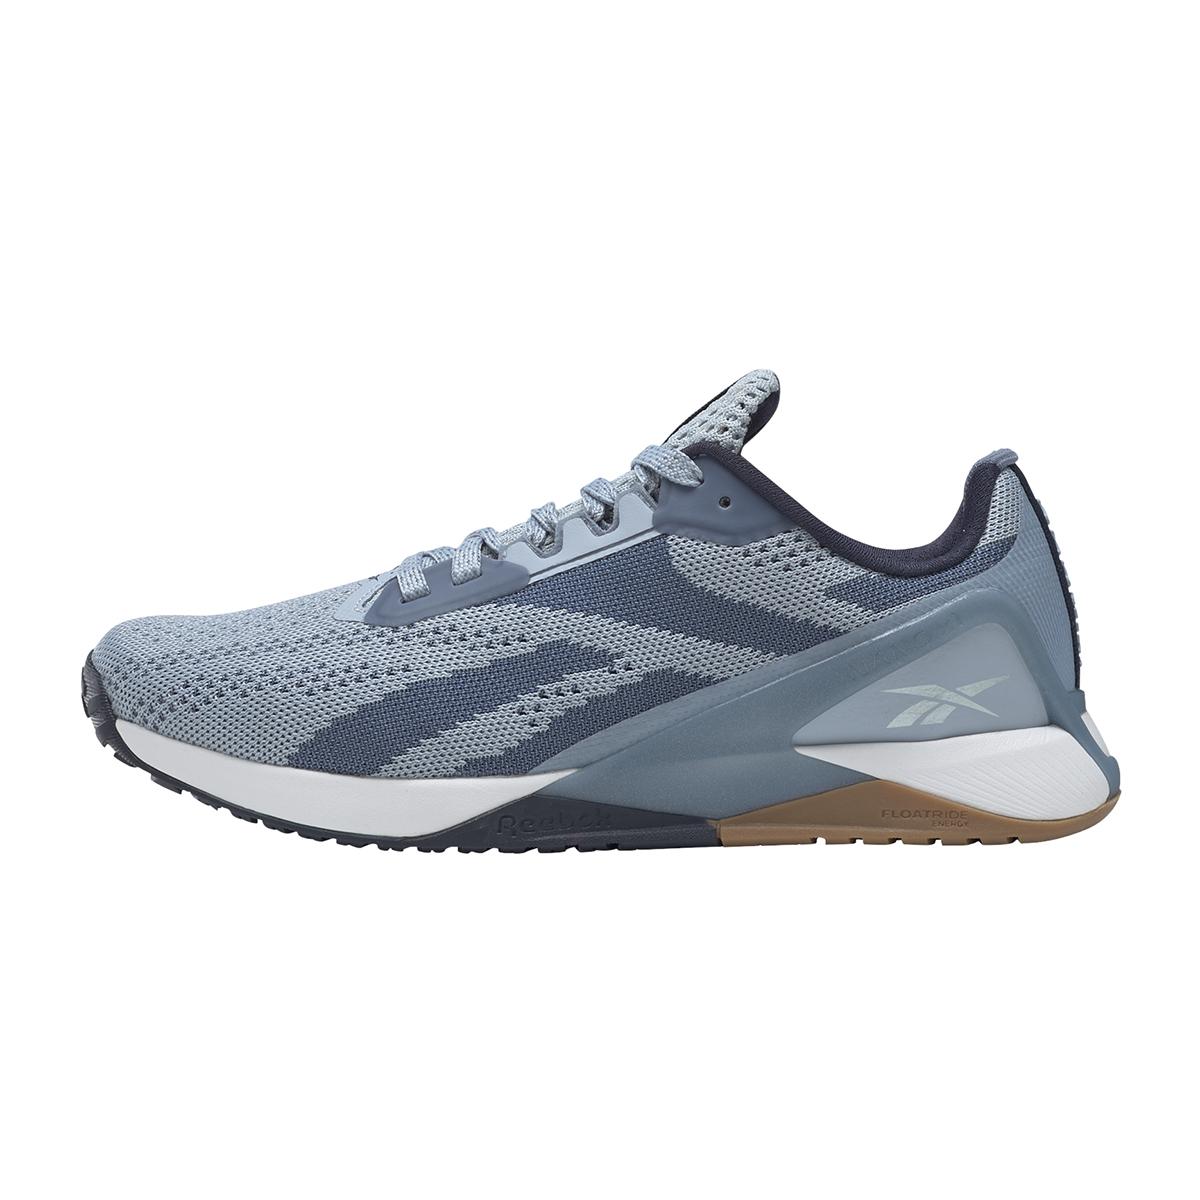 Women's Reebok Nano X1 Training Shoe - Color: Gable Grey/Blue Slate/Vector Navy - Size: 5 - Width: Regular, Gable Grey/Blue Slate/Vector Navy, large, image 2